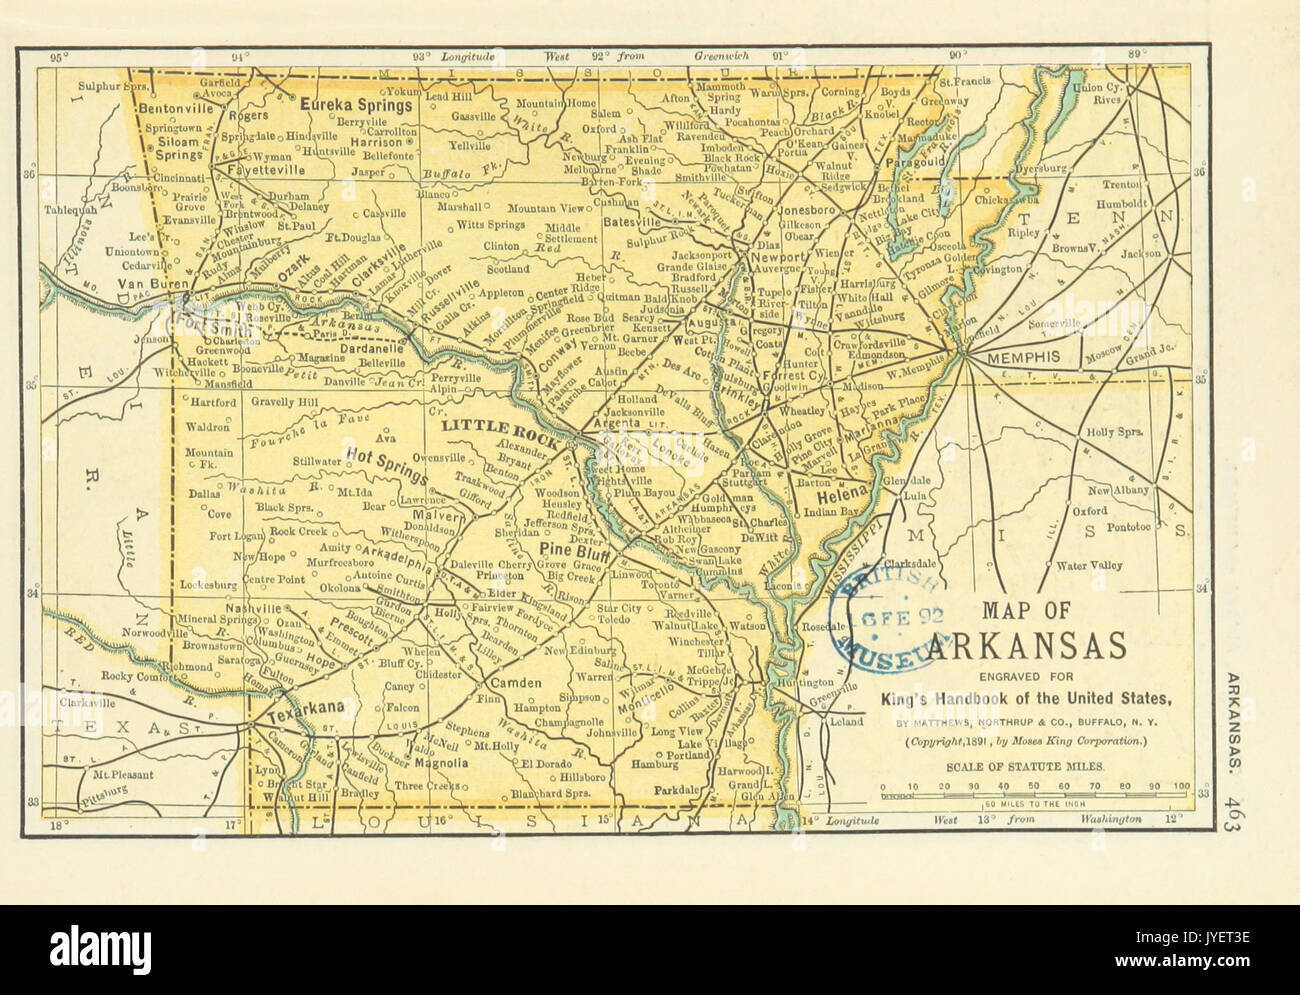 Arkansas State Maps USA Maps Of Arkansas AR Arkansas State - Arkansas us map